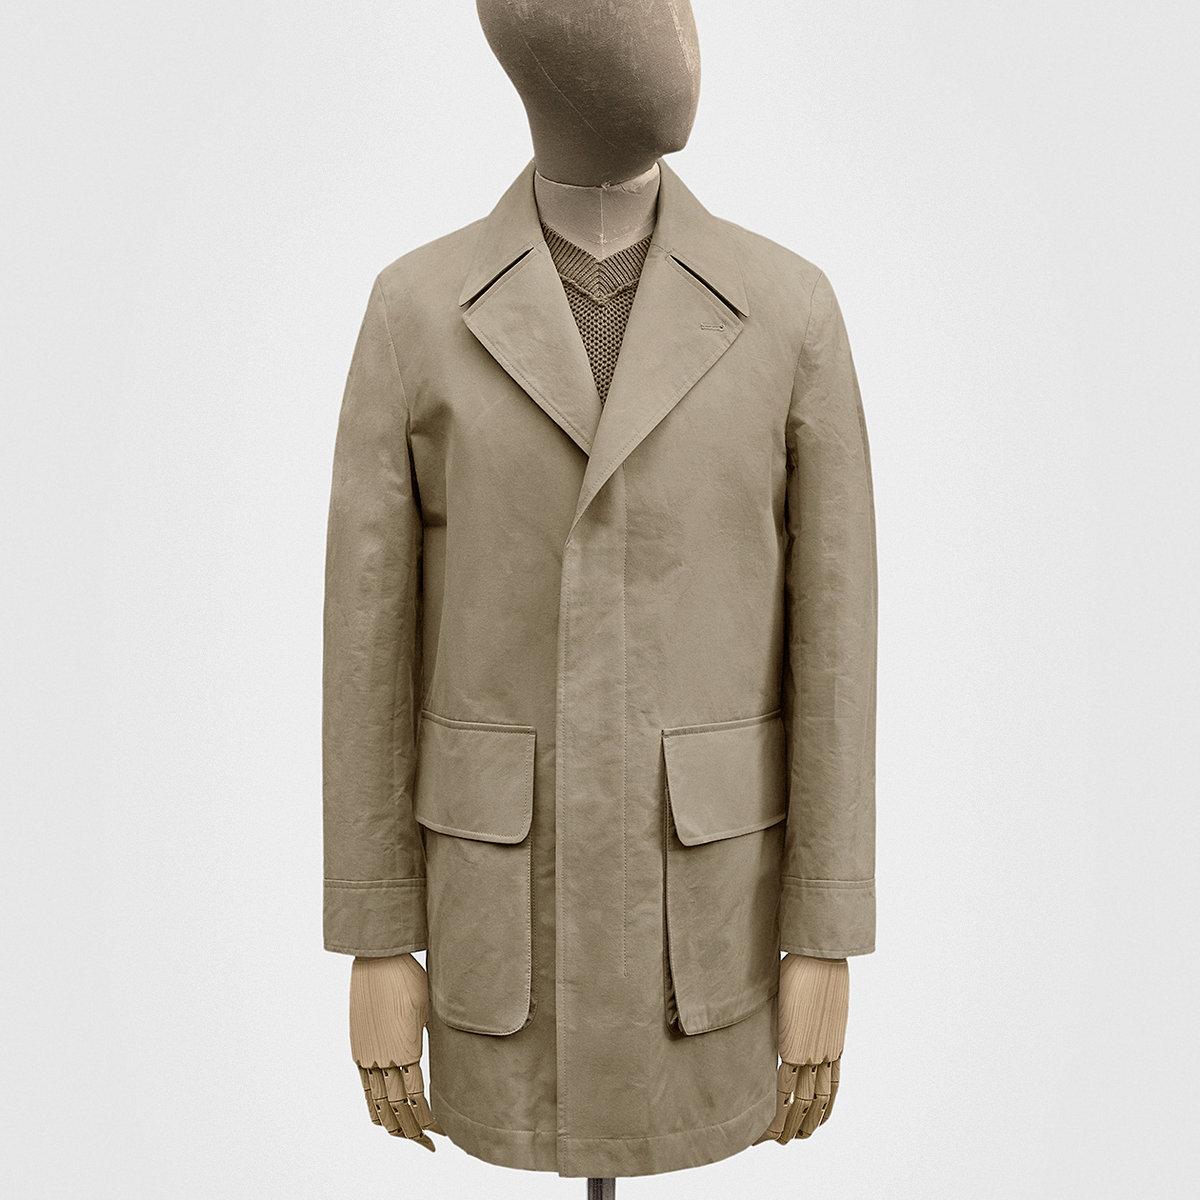 car-coat-cotton-staywax-parchment-1@2x.jpg